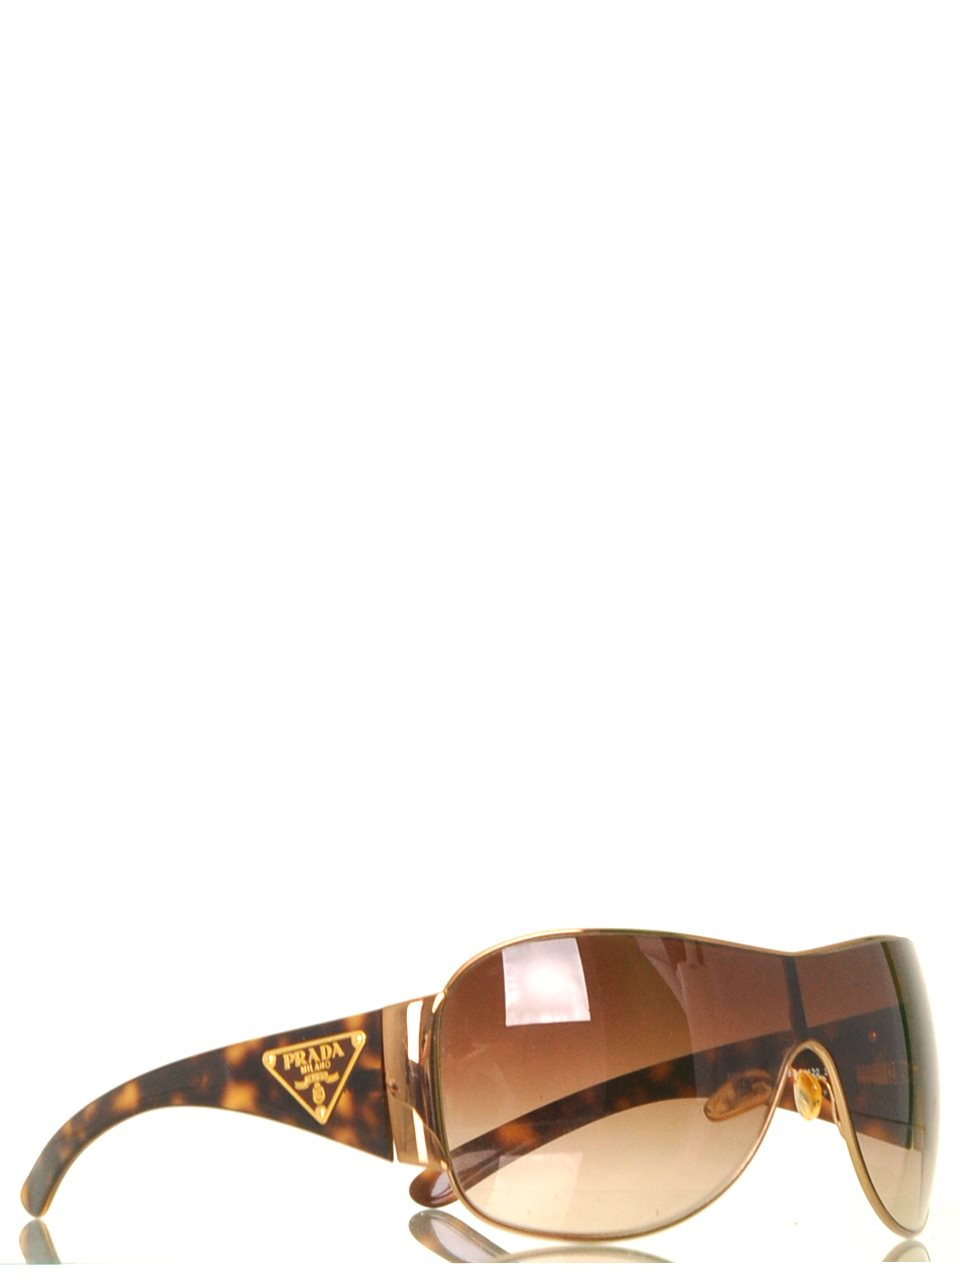 Prada - Sunglasses - Image 2 of 5